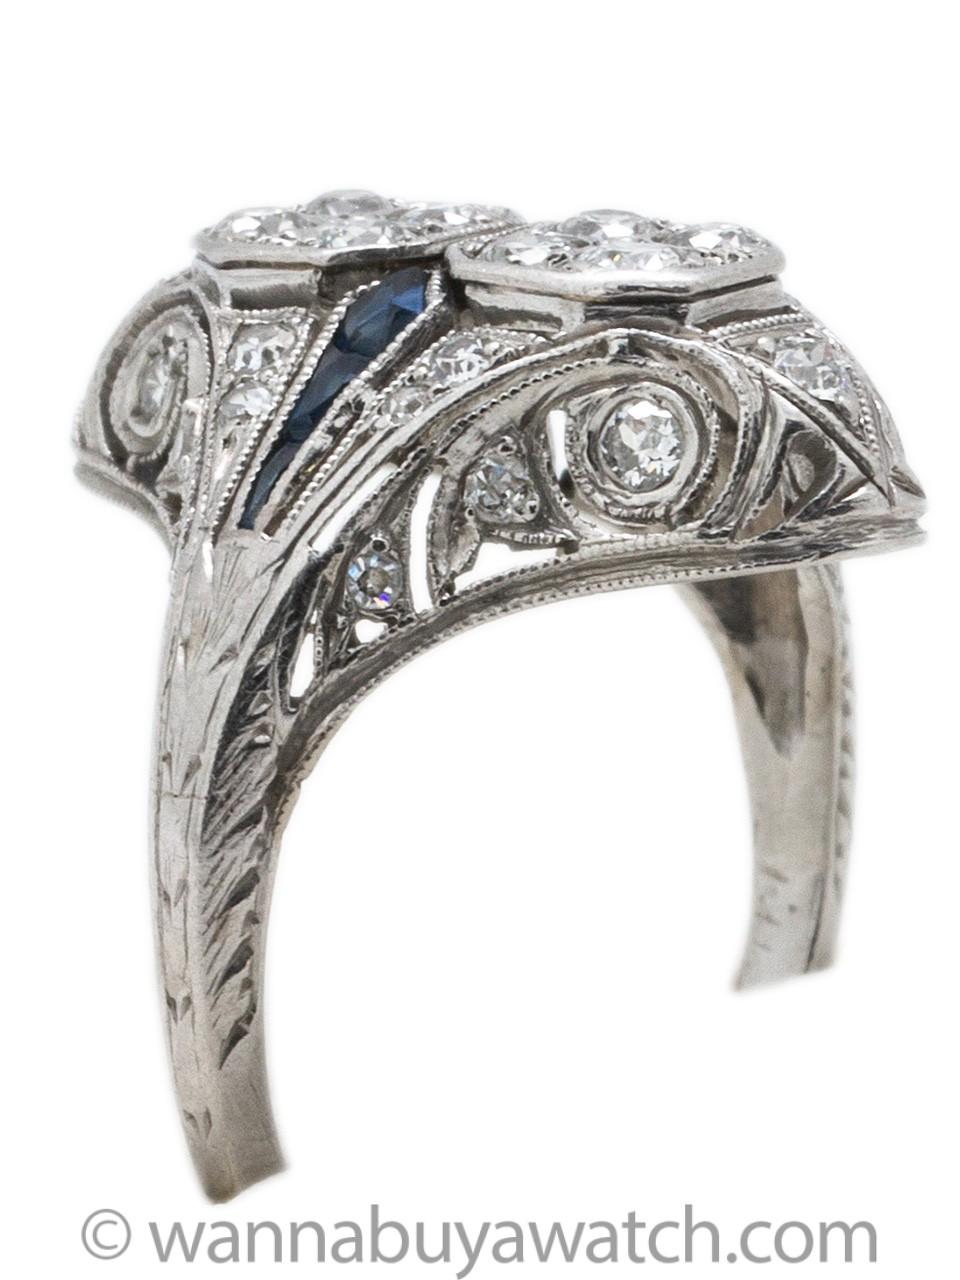 Stunning Art Deco Platinum Diamond & Sapphire Cocktail Ring circa 1920s